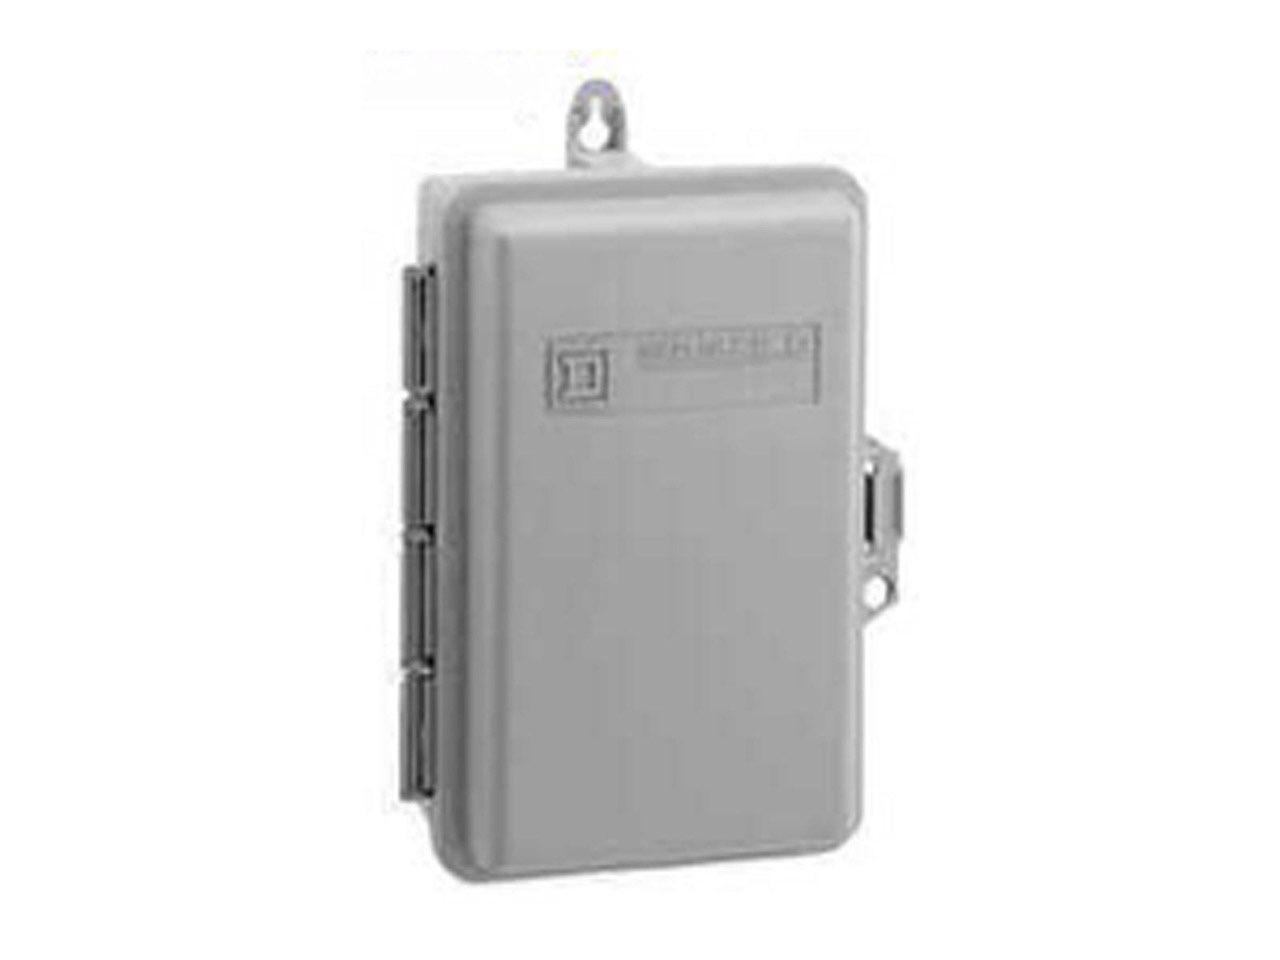 Hidden Cameras - Business Surveillance - Page 1 - BrickHouse Security